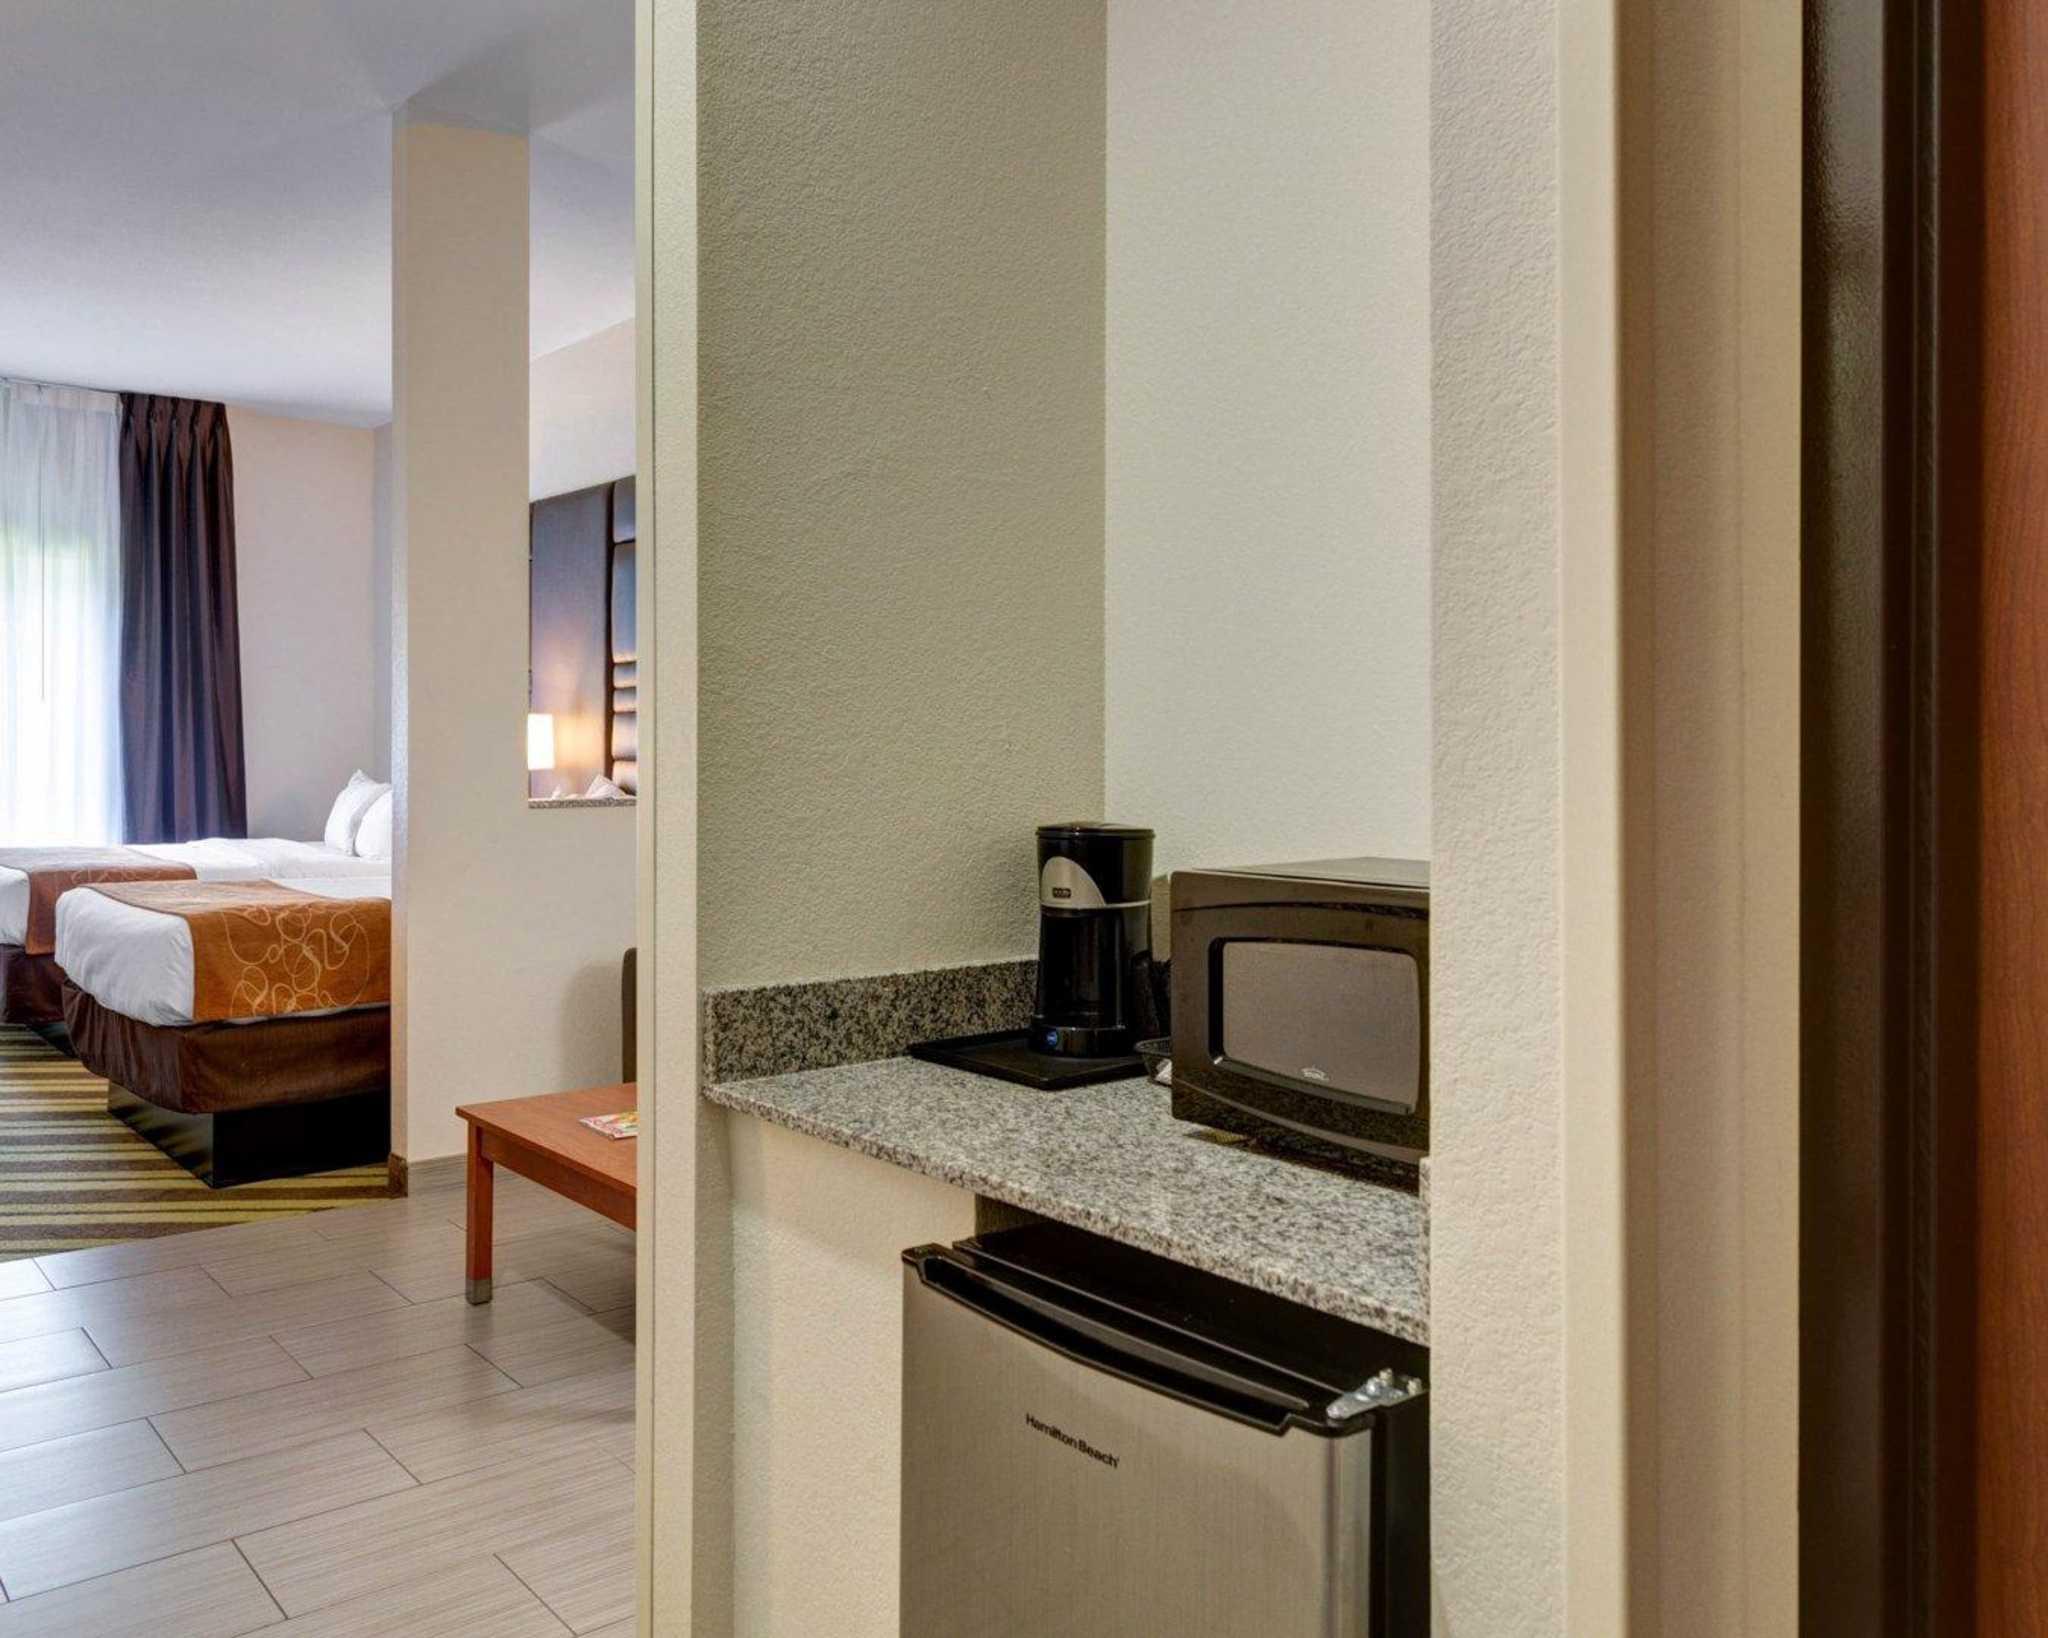 Comfort Suites image 17